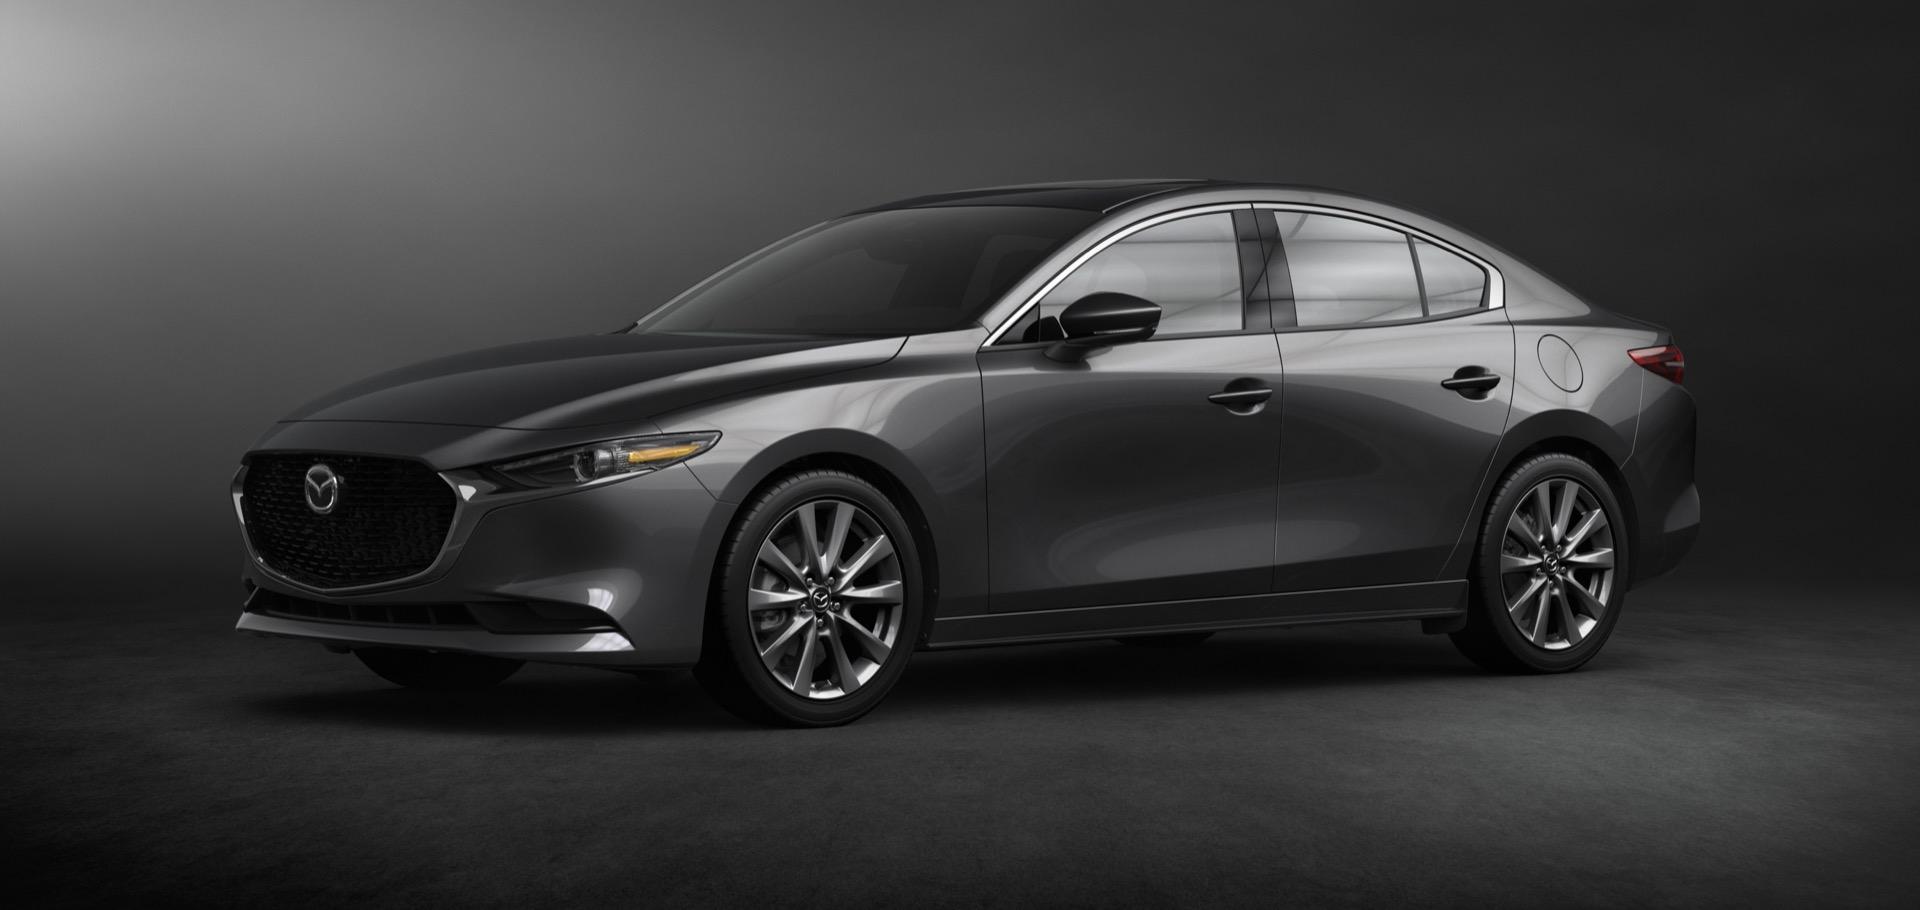 Kekurangan Mazda 3 2019 Sedan Murah Berkualitas